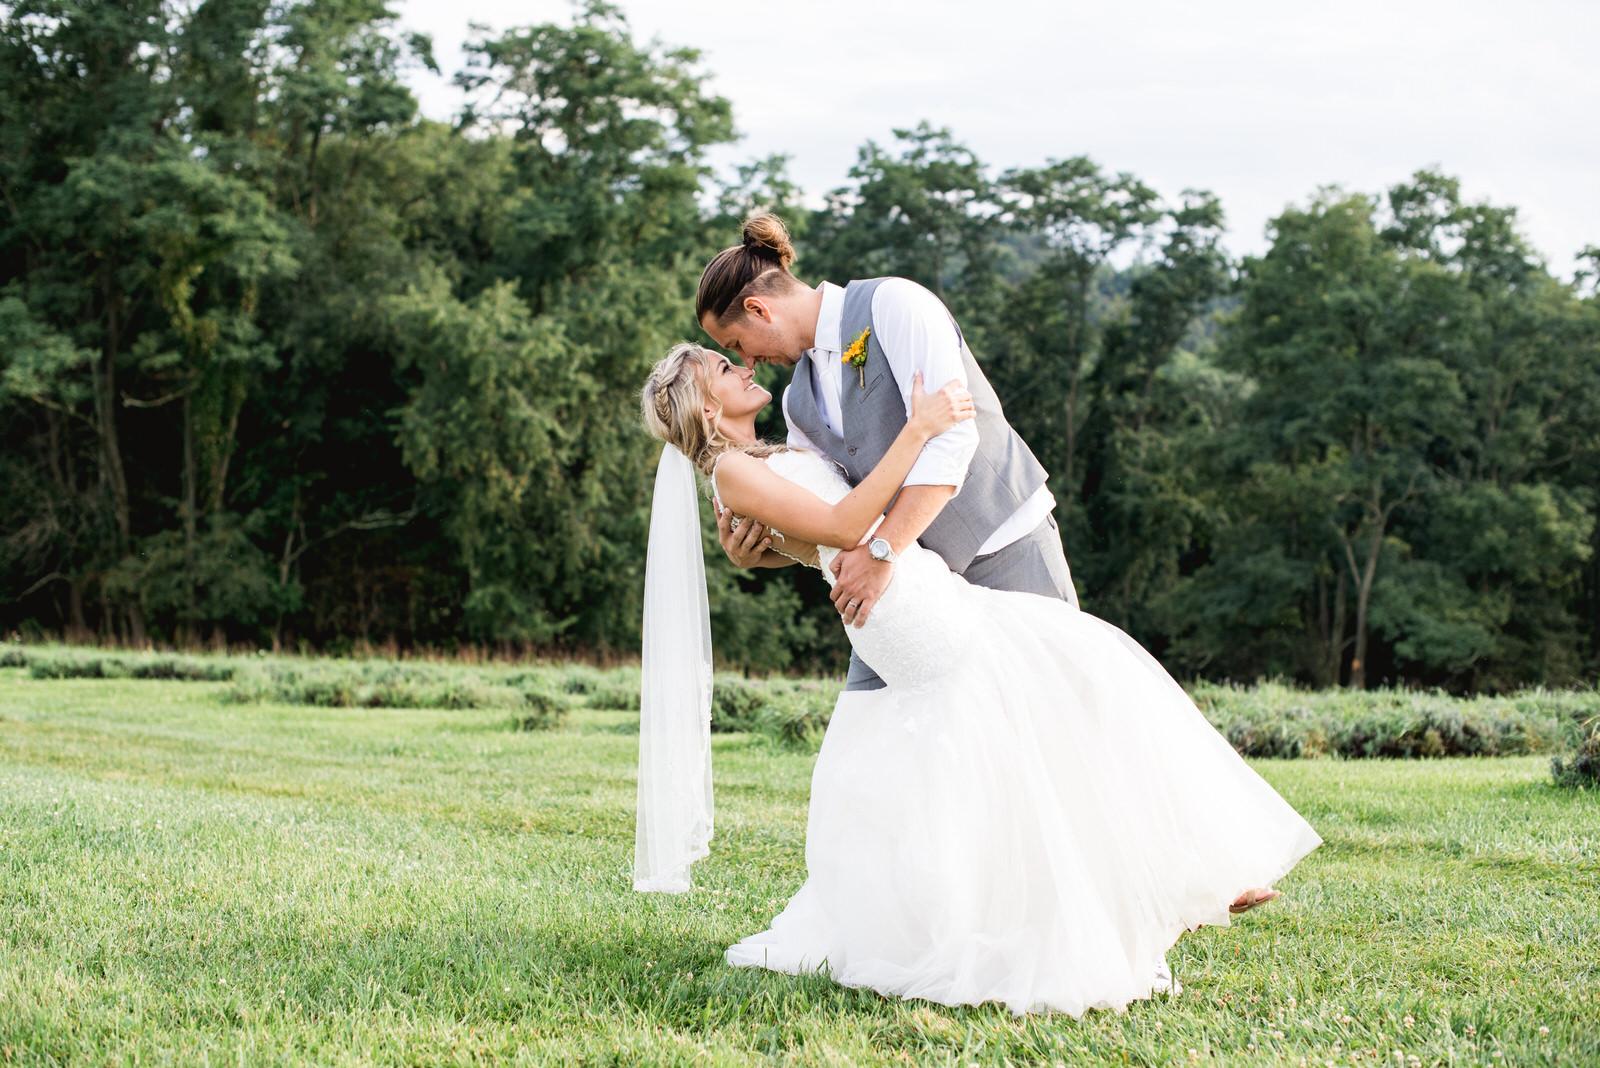 destiny-hill-farm-wedding-photos-pittsburgh-wedding-photographers-63.jpg